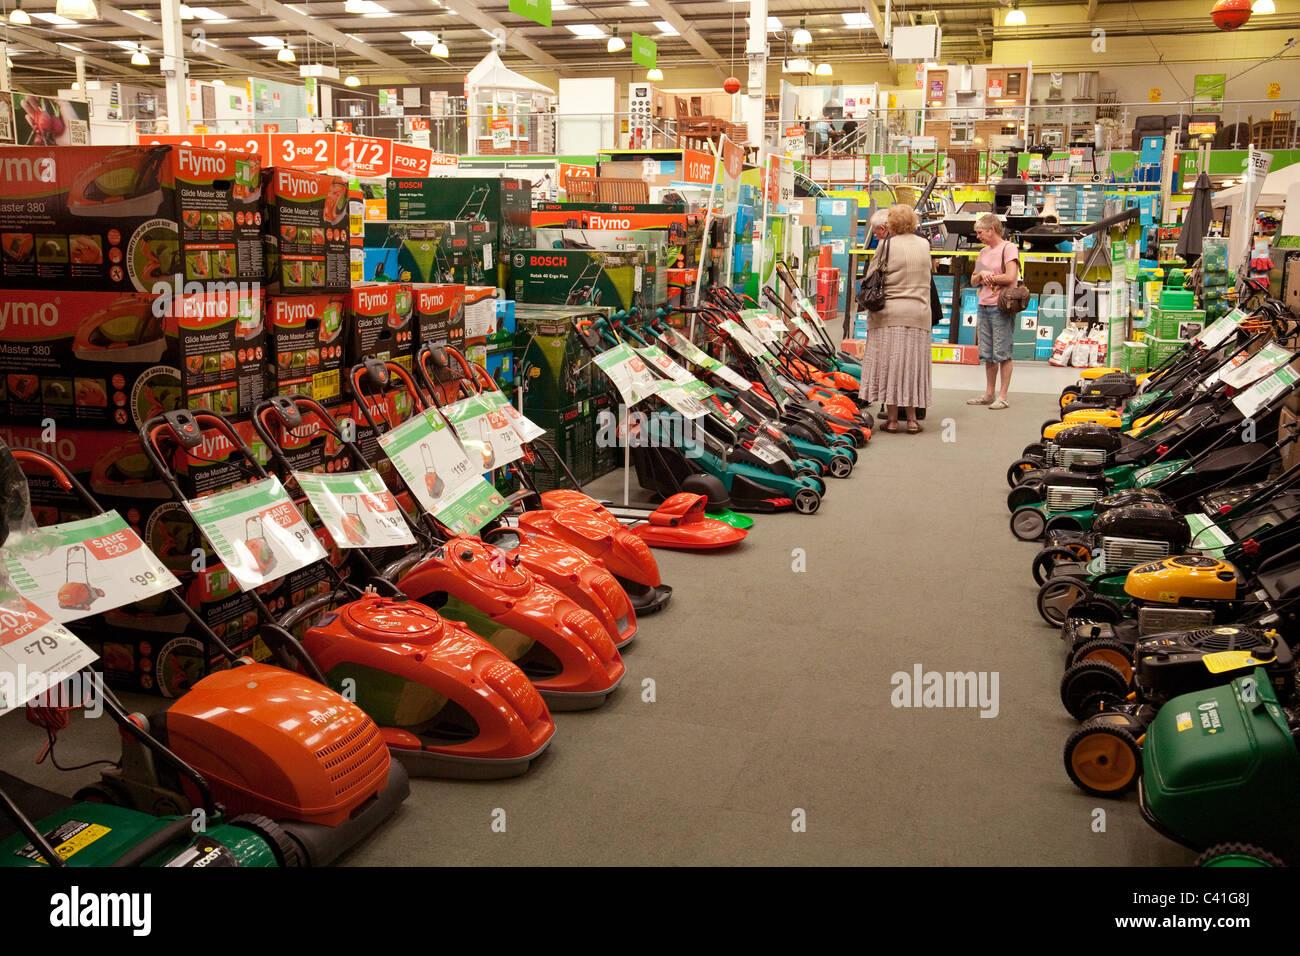 Gardening Store Stock Photos & Gardening Store Stock Images - Alamy